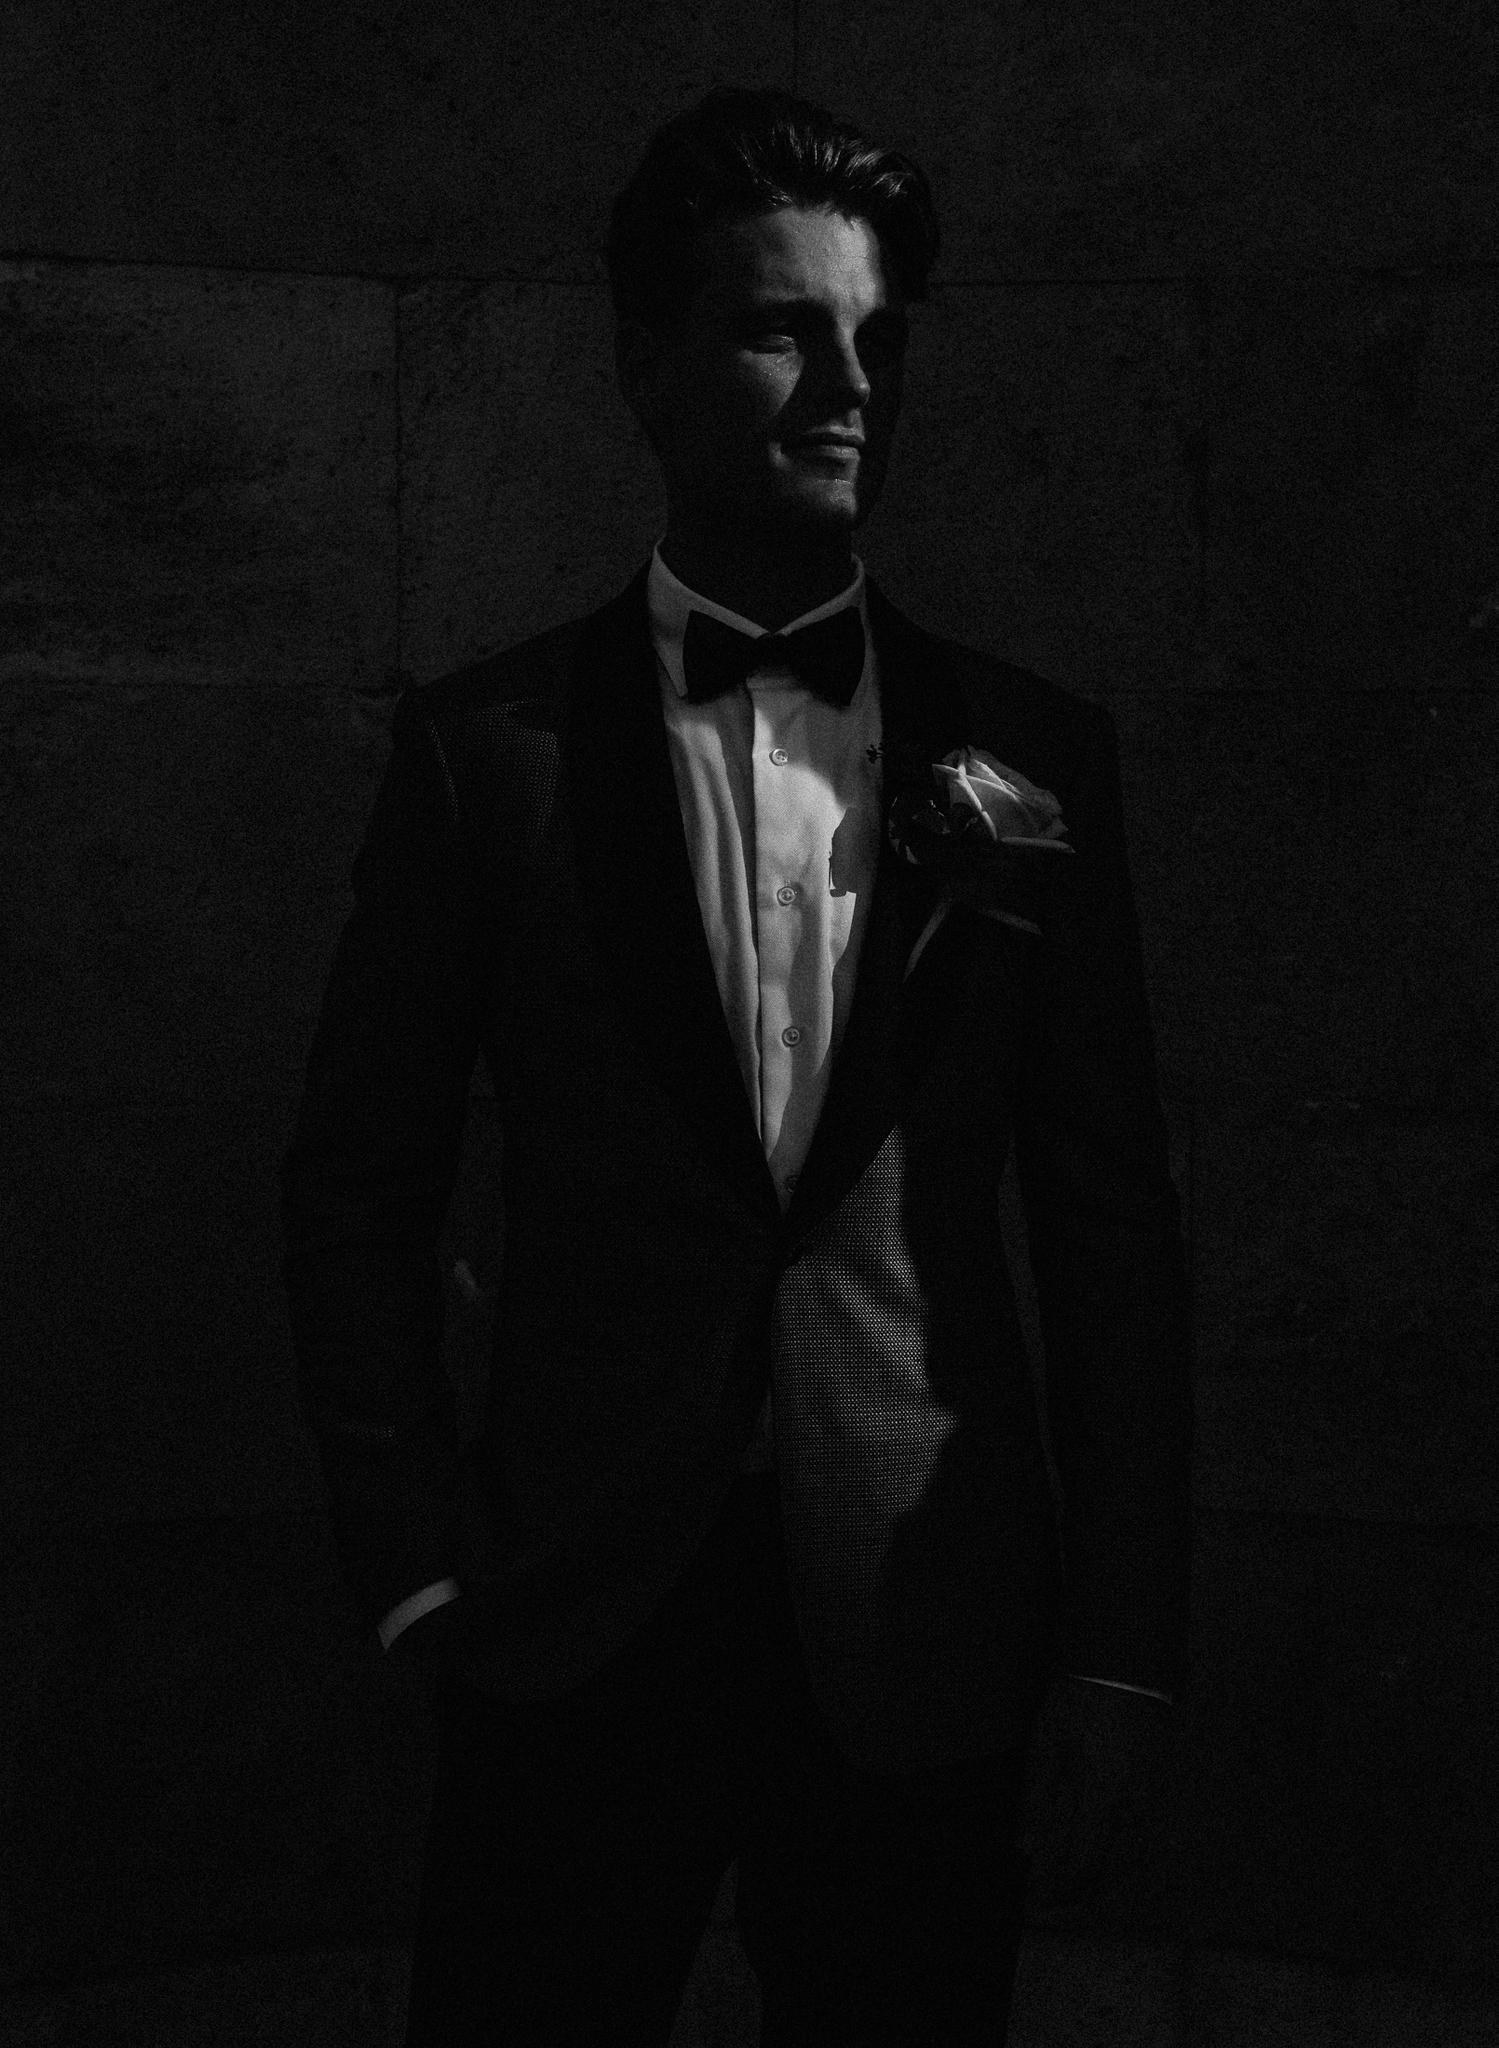 destination-austin-wedding-photographer-italy-florence491.JPG